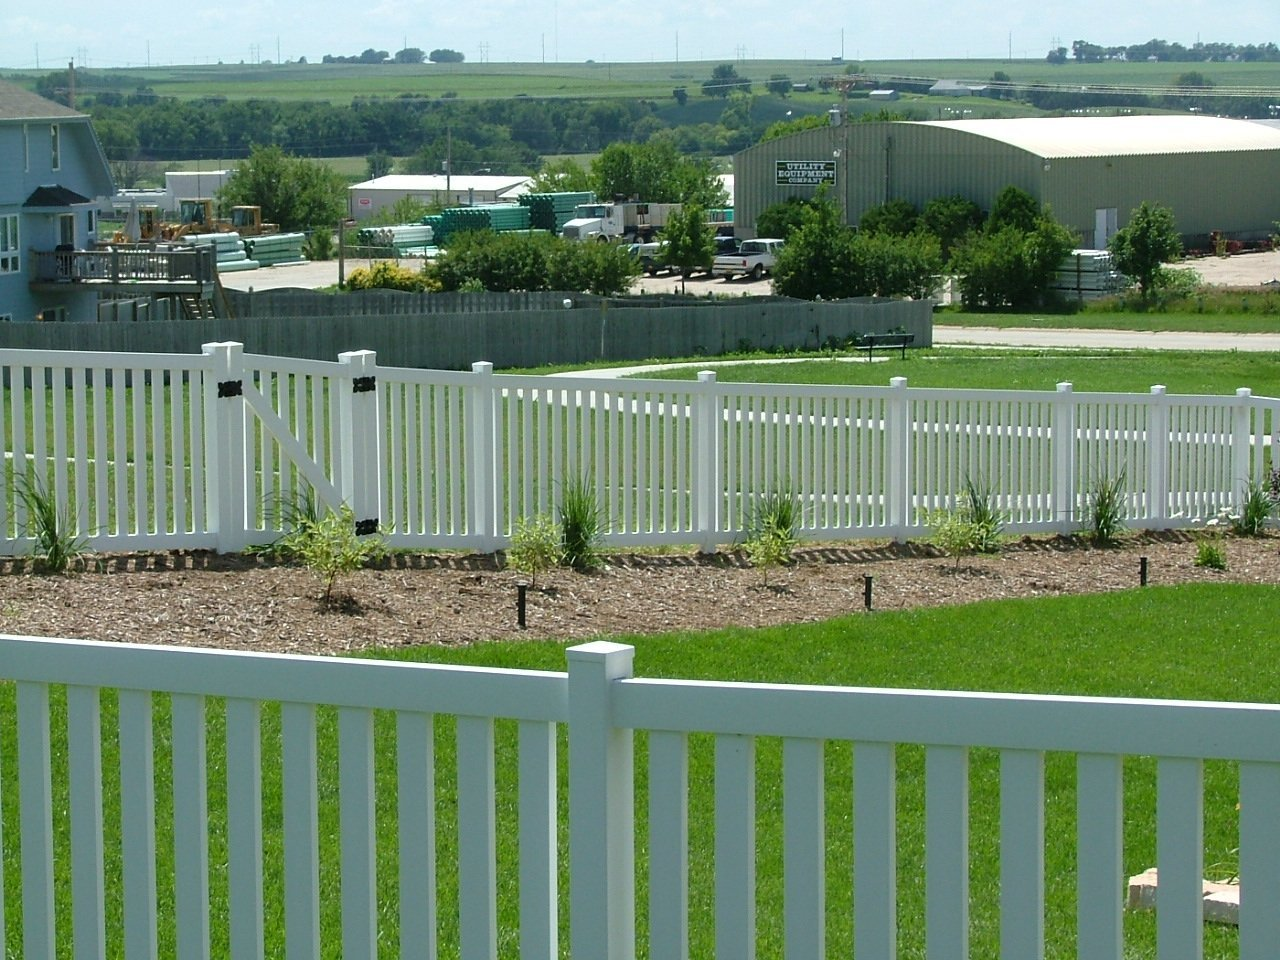 Dakota Fence & Deck 4' white pvc closed picket - Omaha and Papillion, Nebraska